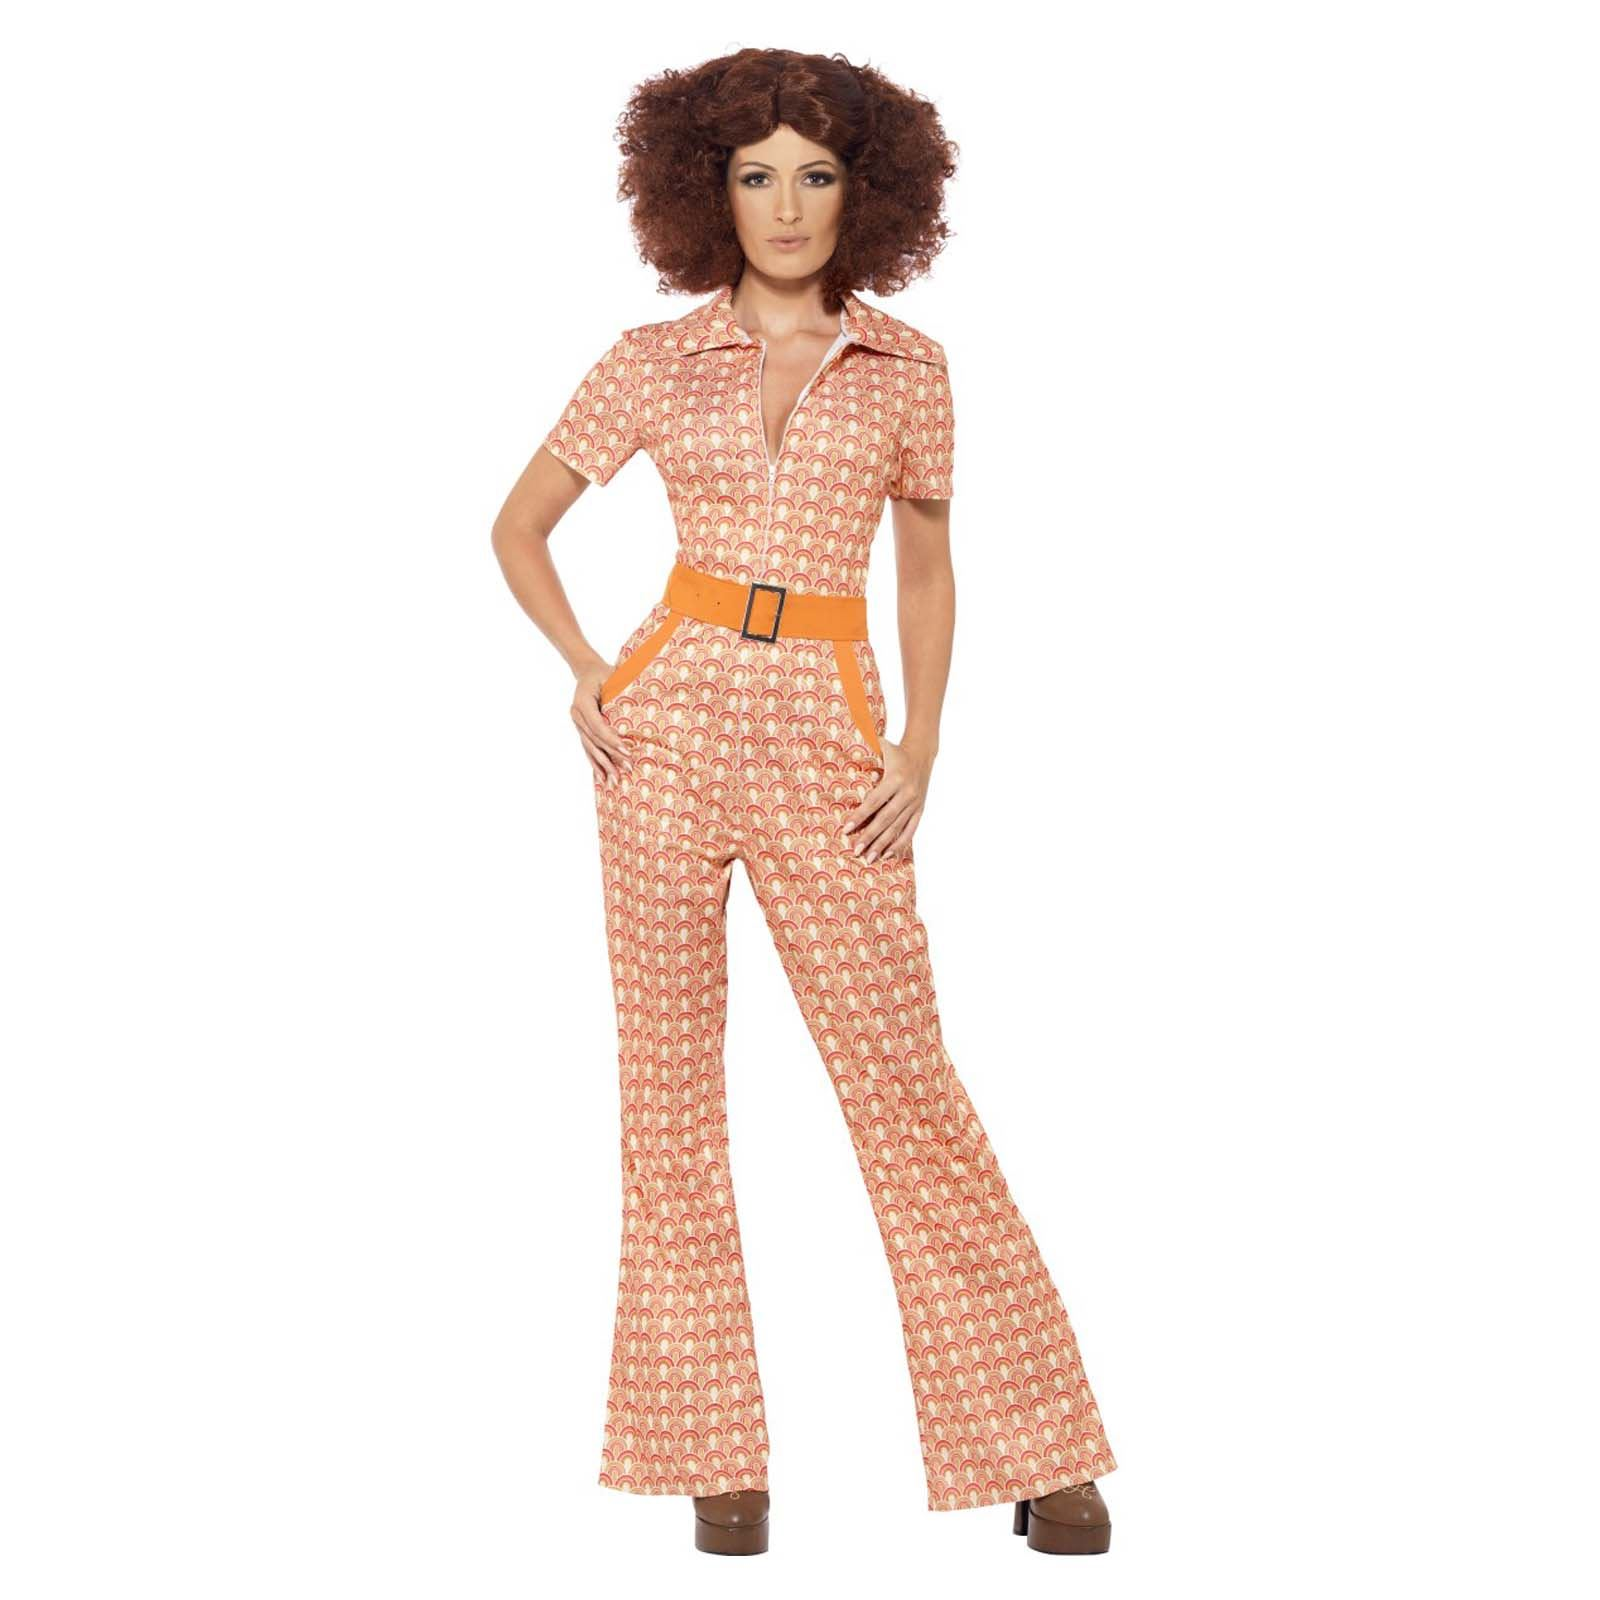 Canzonette Pantaloni Arancione Da Donna 70er 80er ANNI FESTA